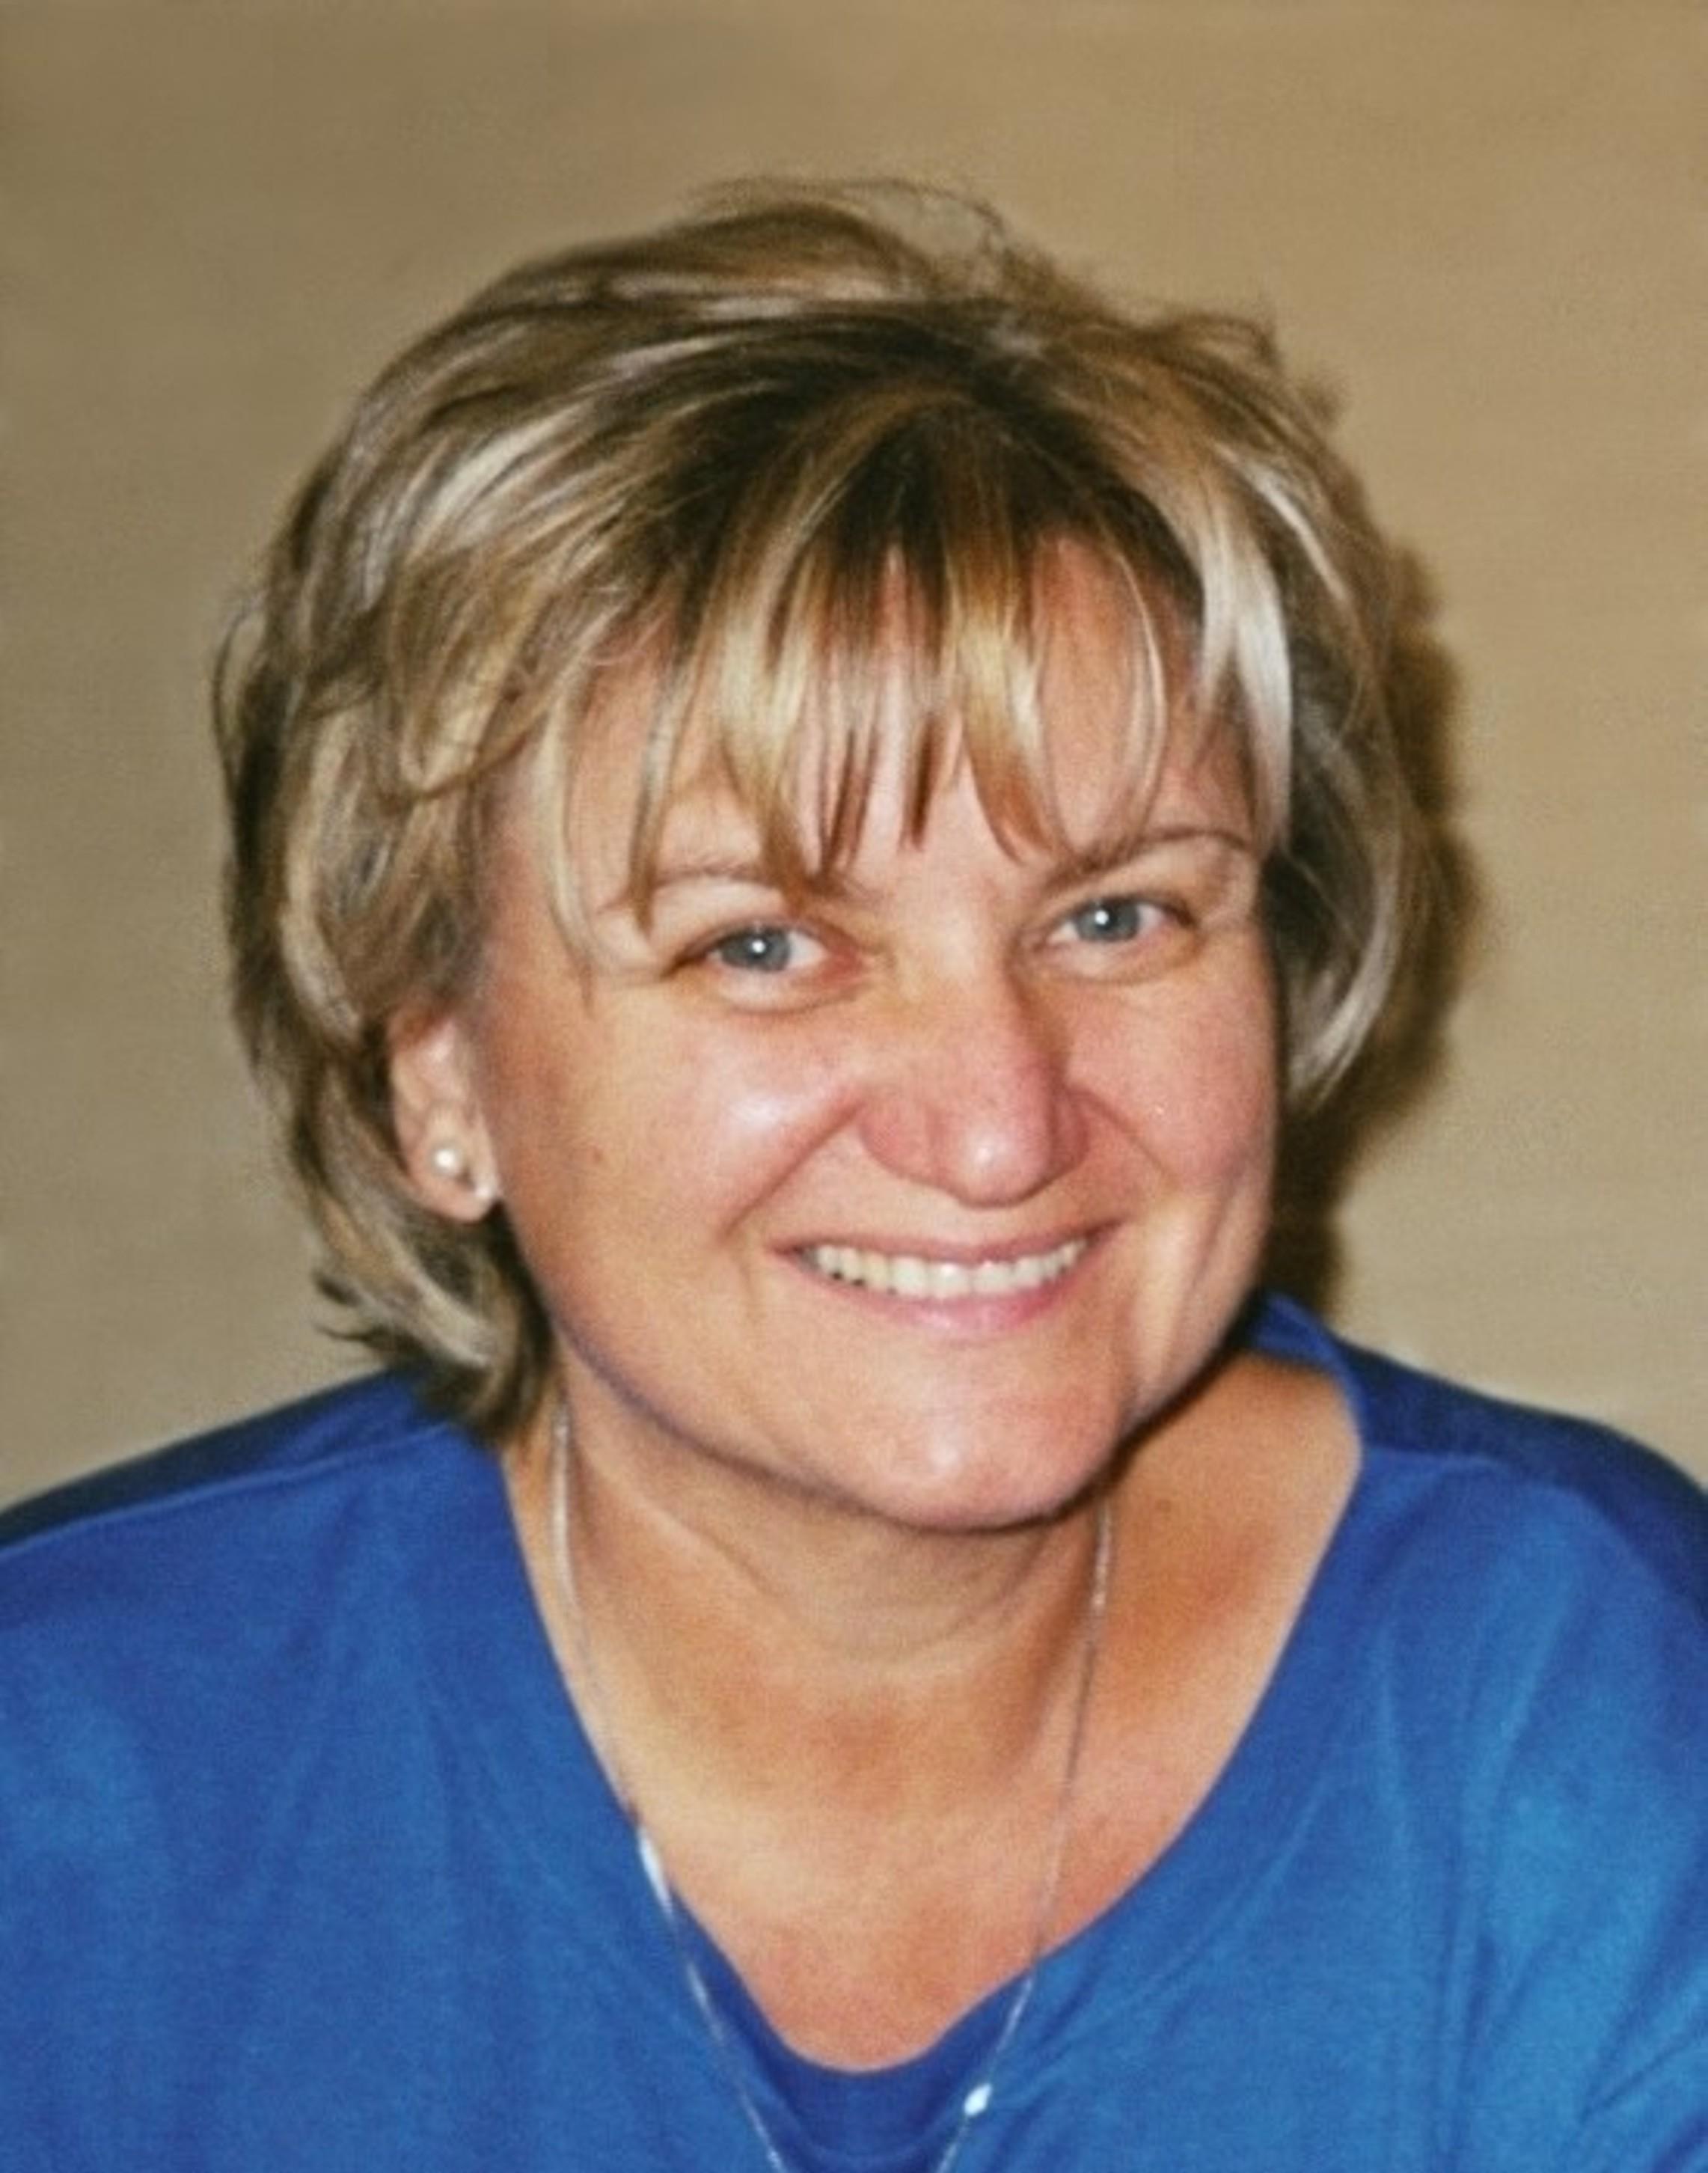 Angela Repka